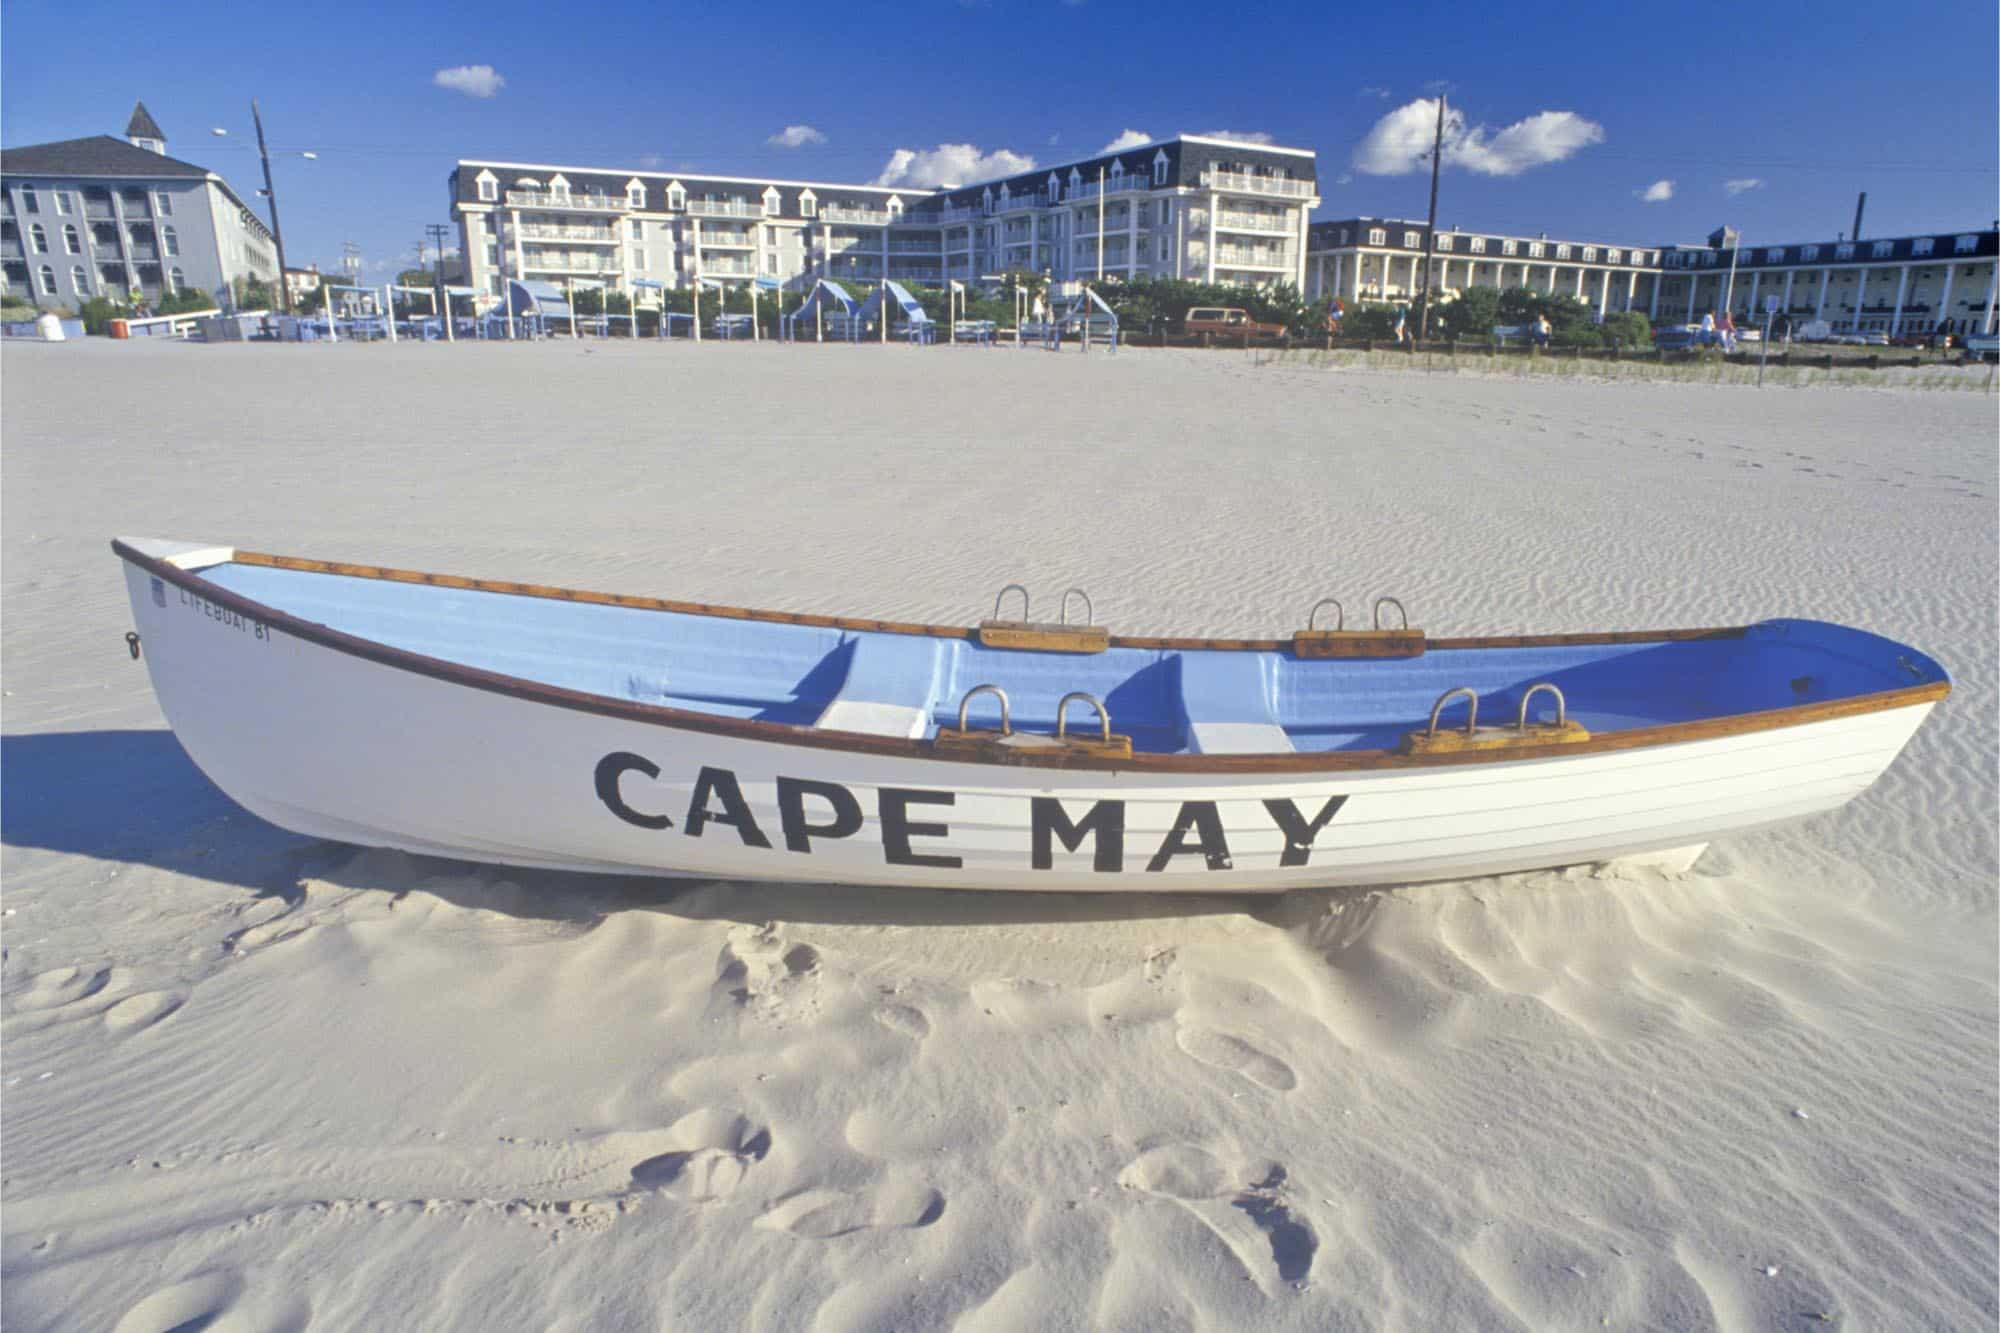 White lifeboat on sandy beach